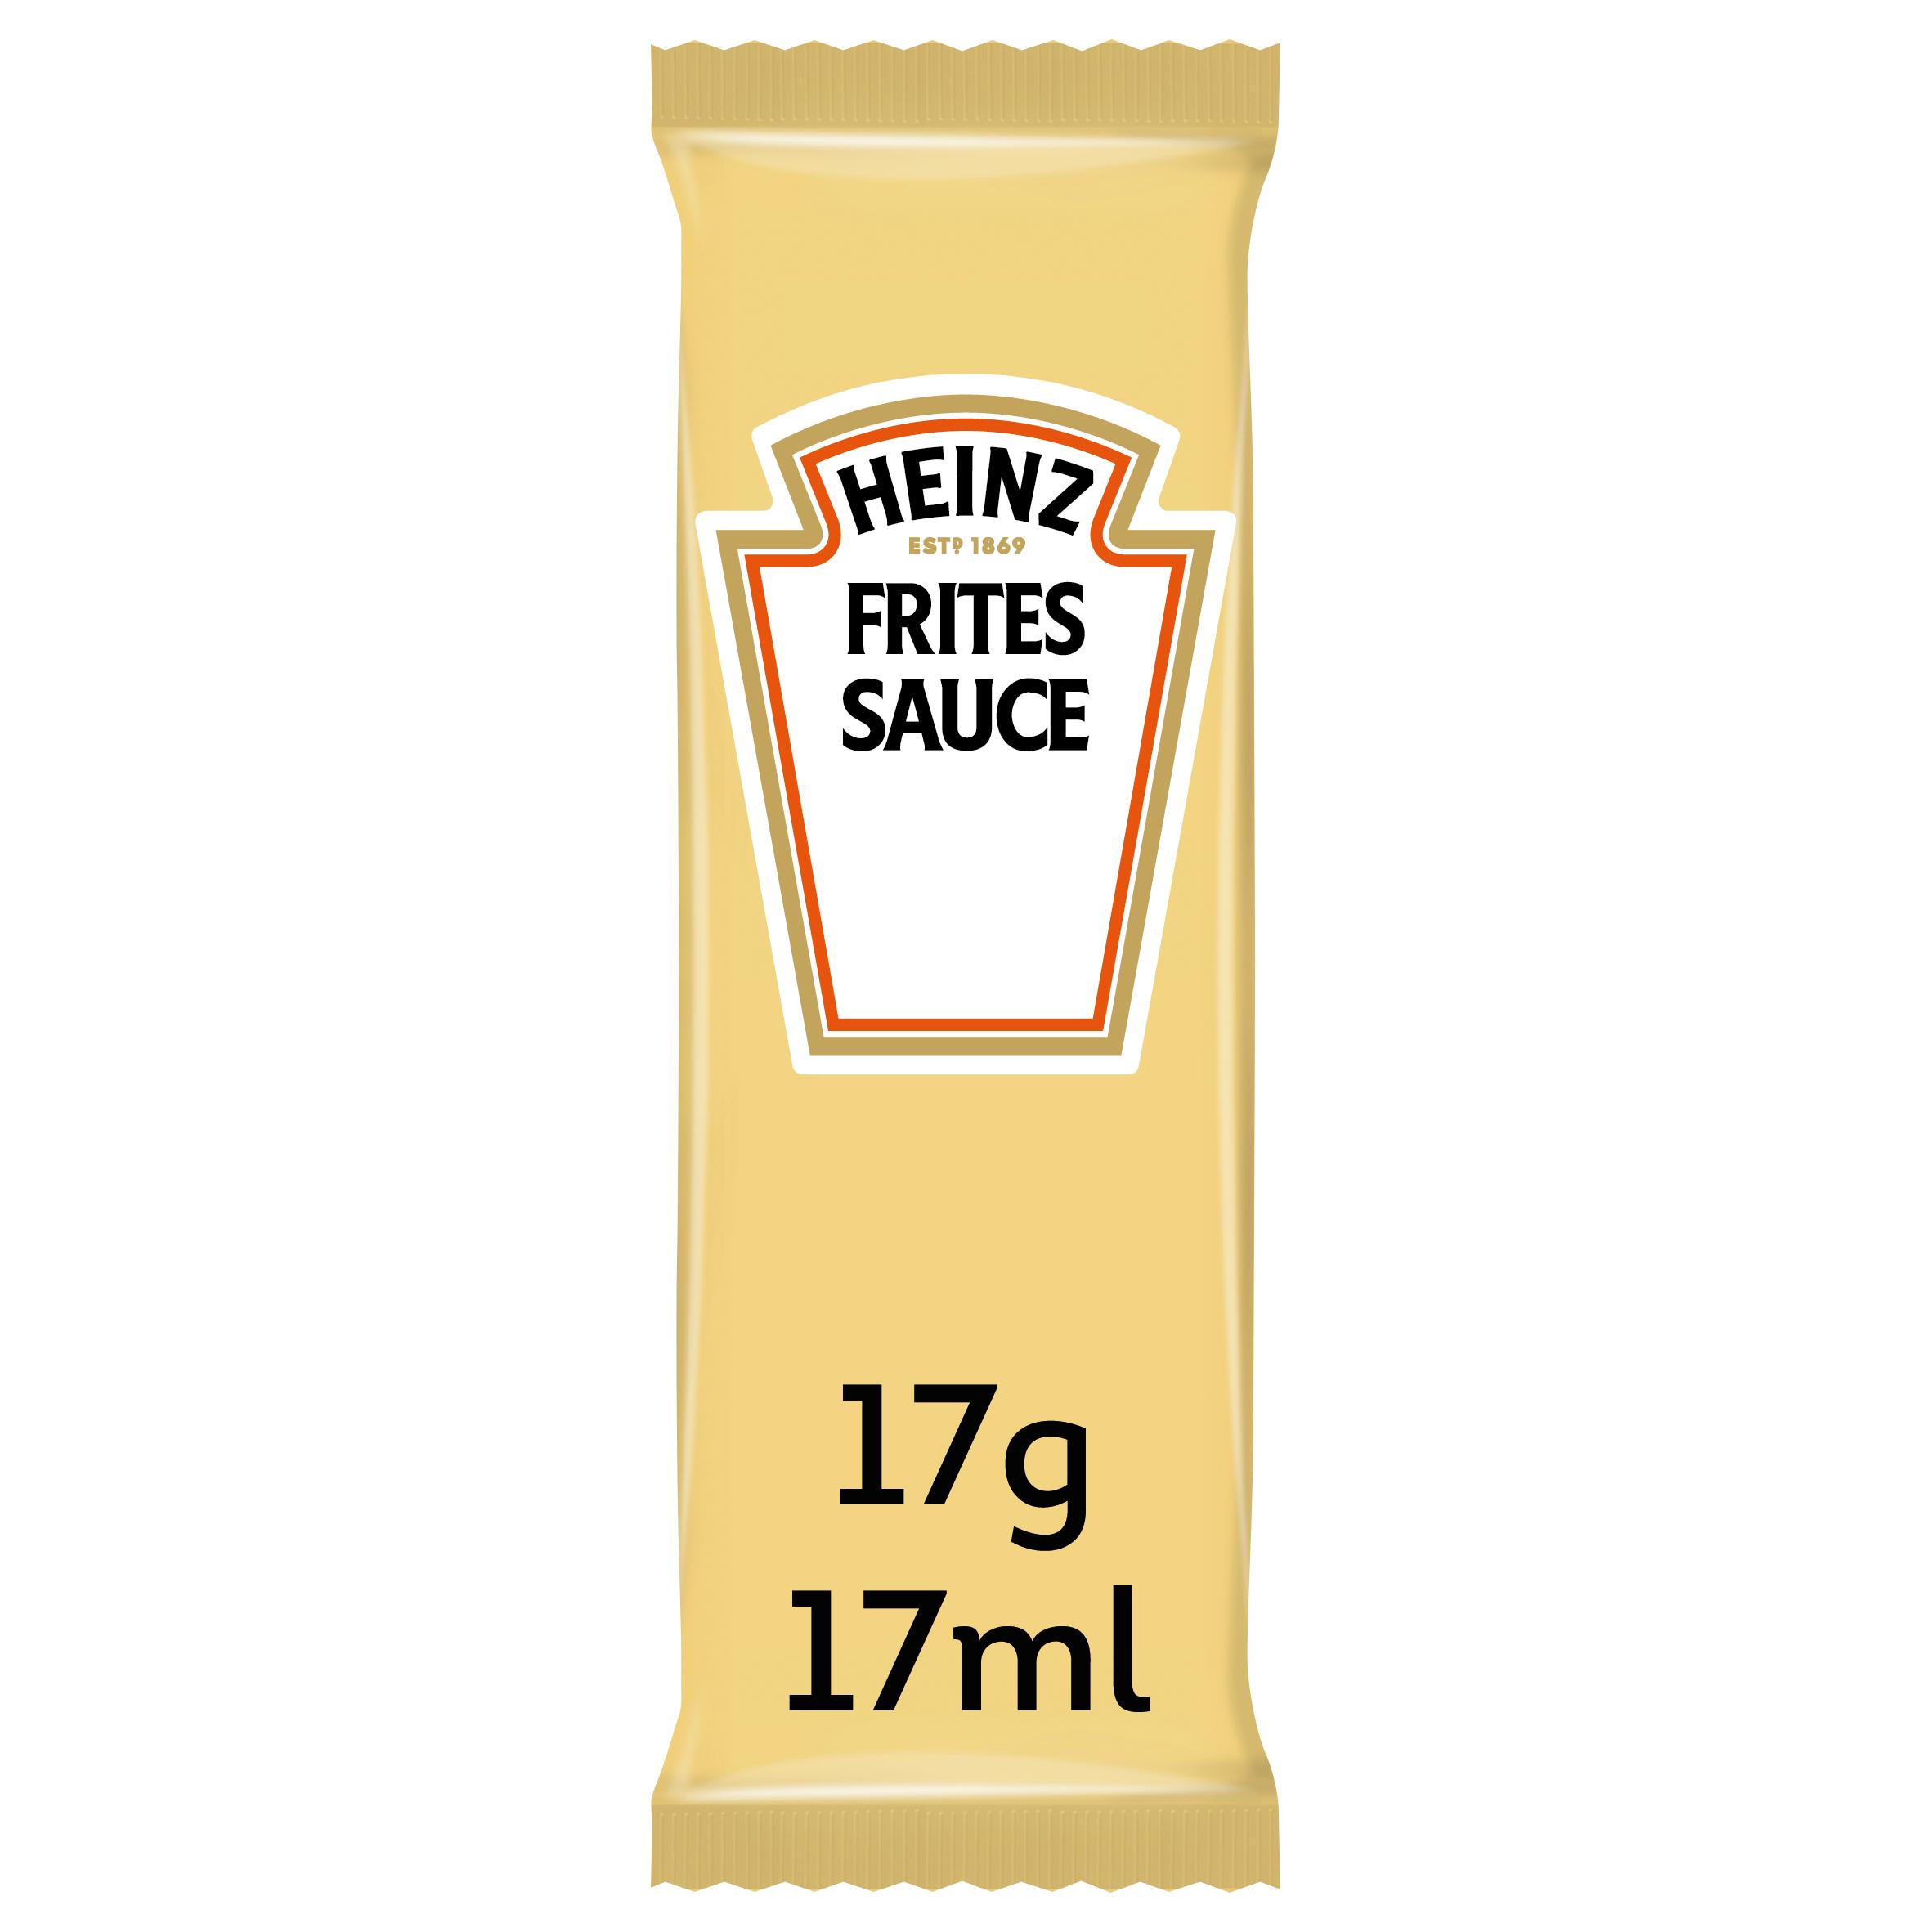 Heinz Mayonnaise 17ml image